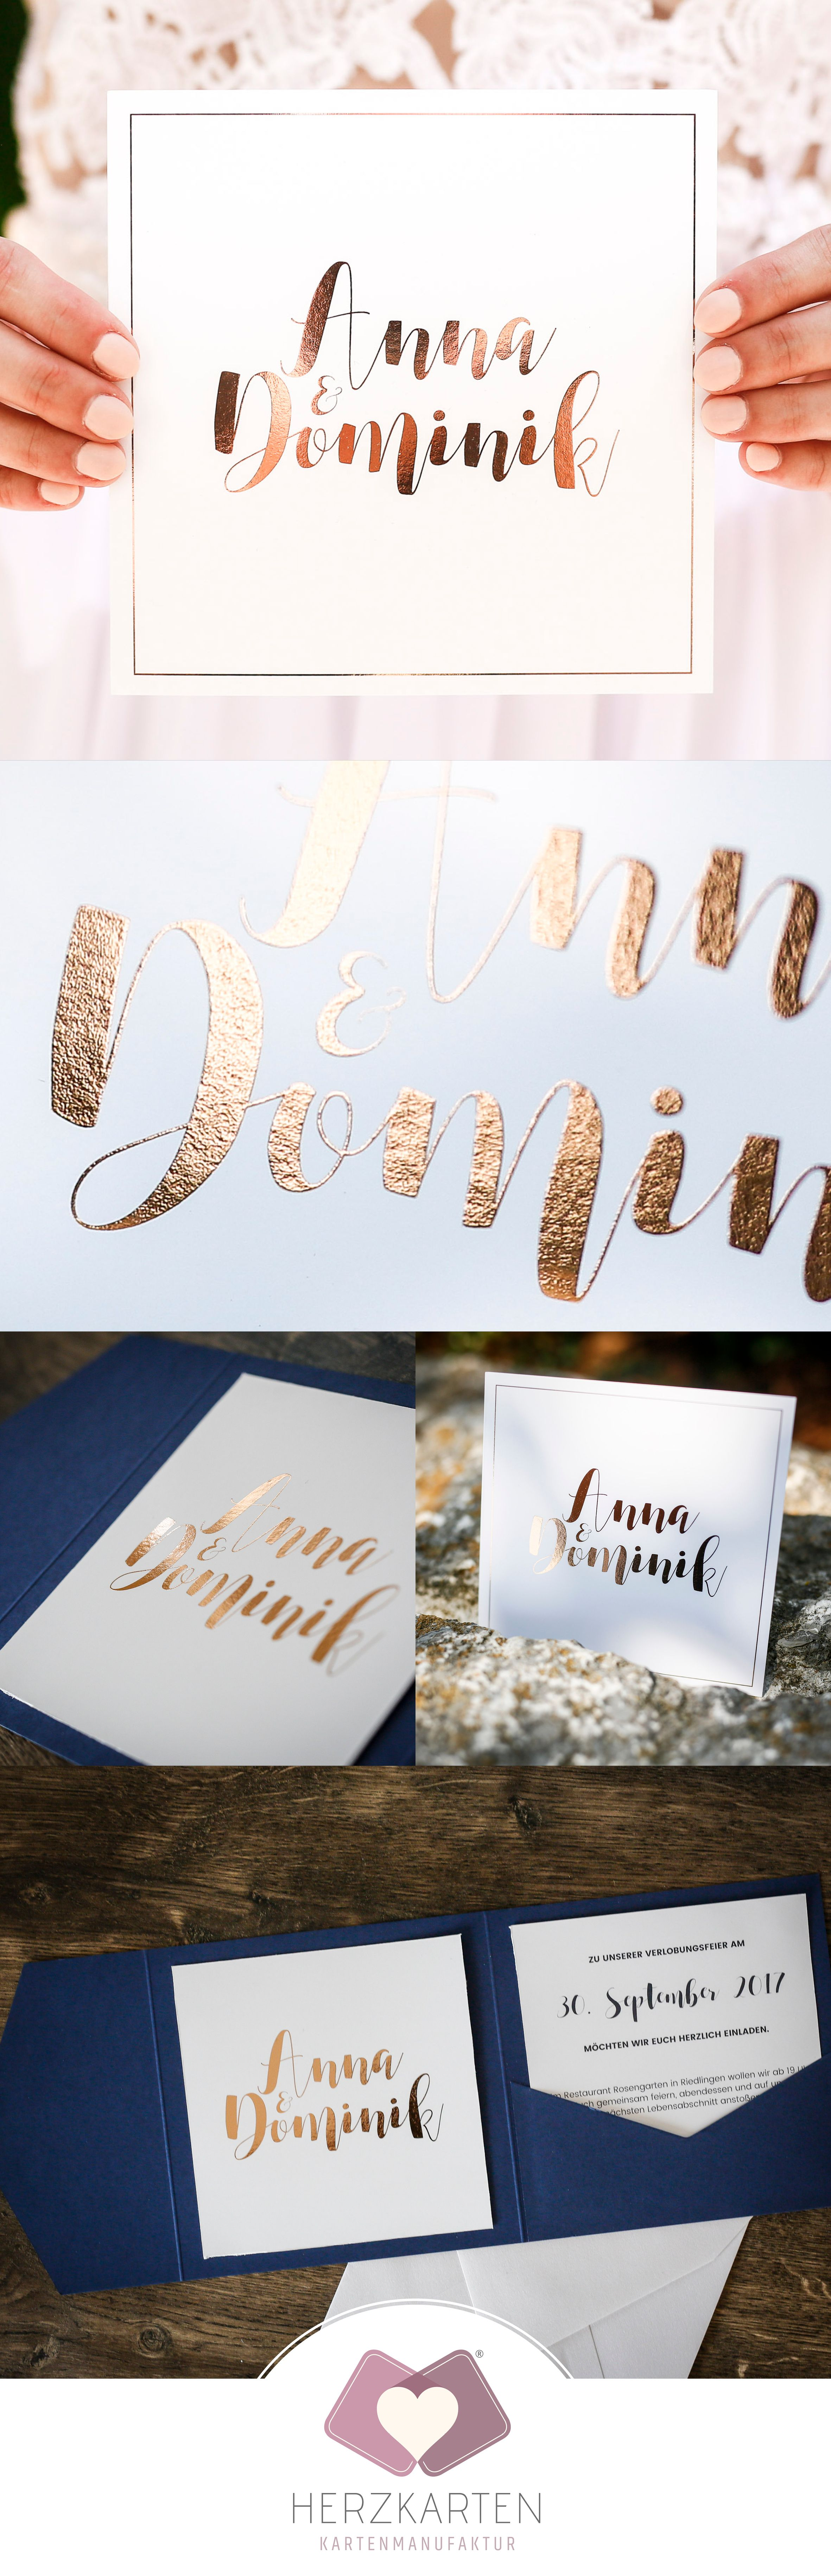 Handlettering Kalligraphie Papeterie Mit Heissfolienpragung In Gold